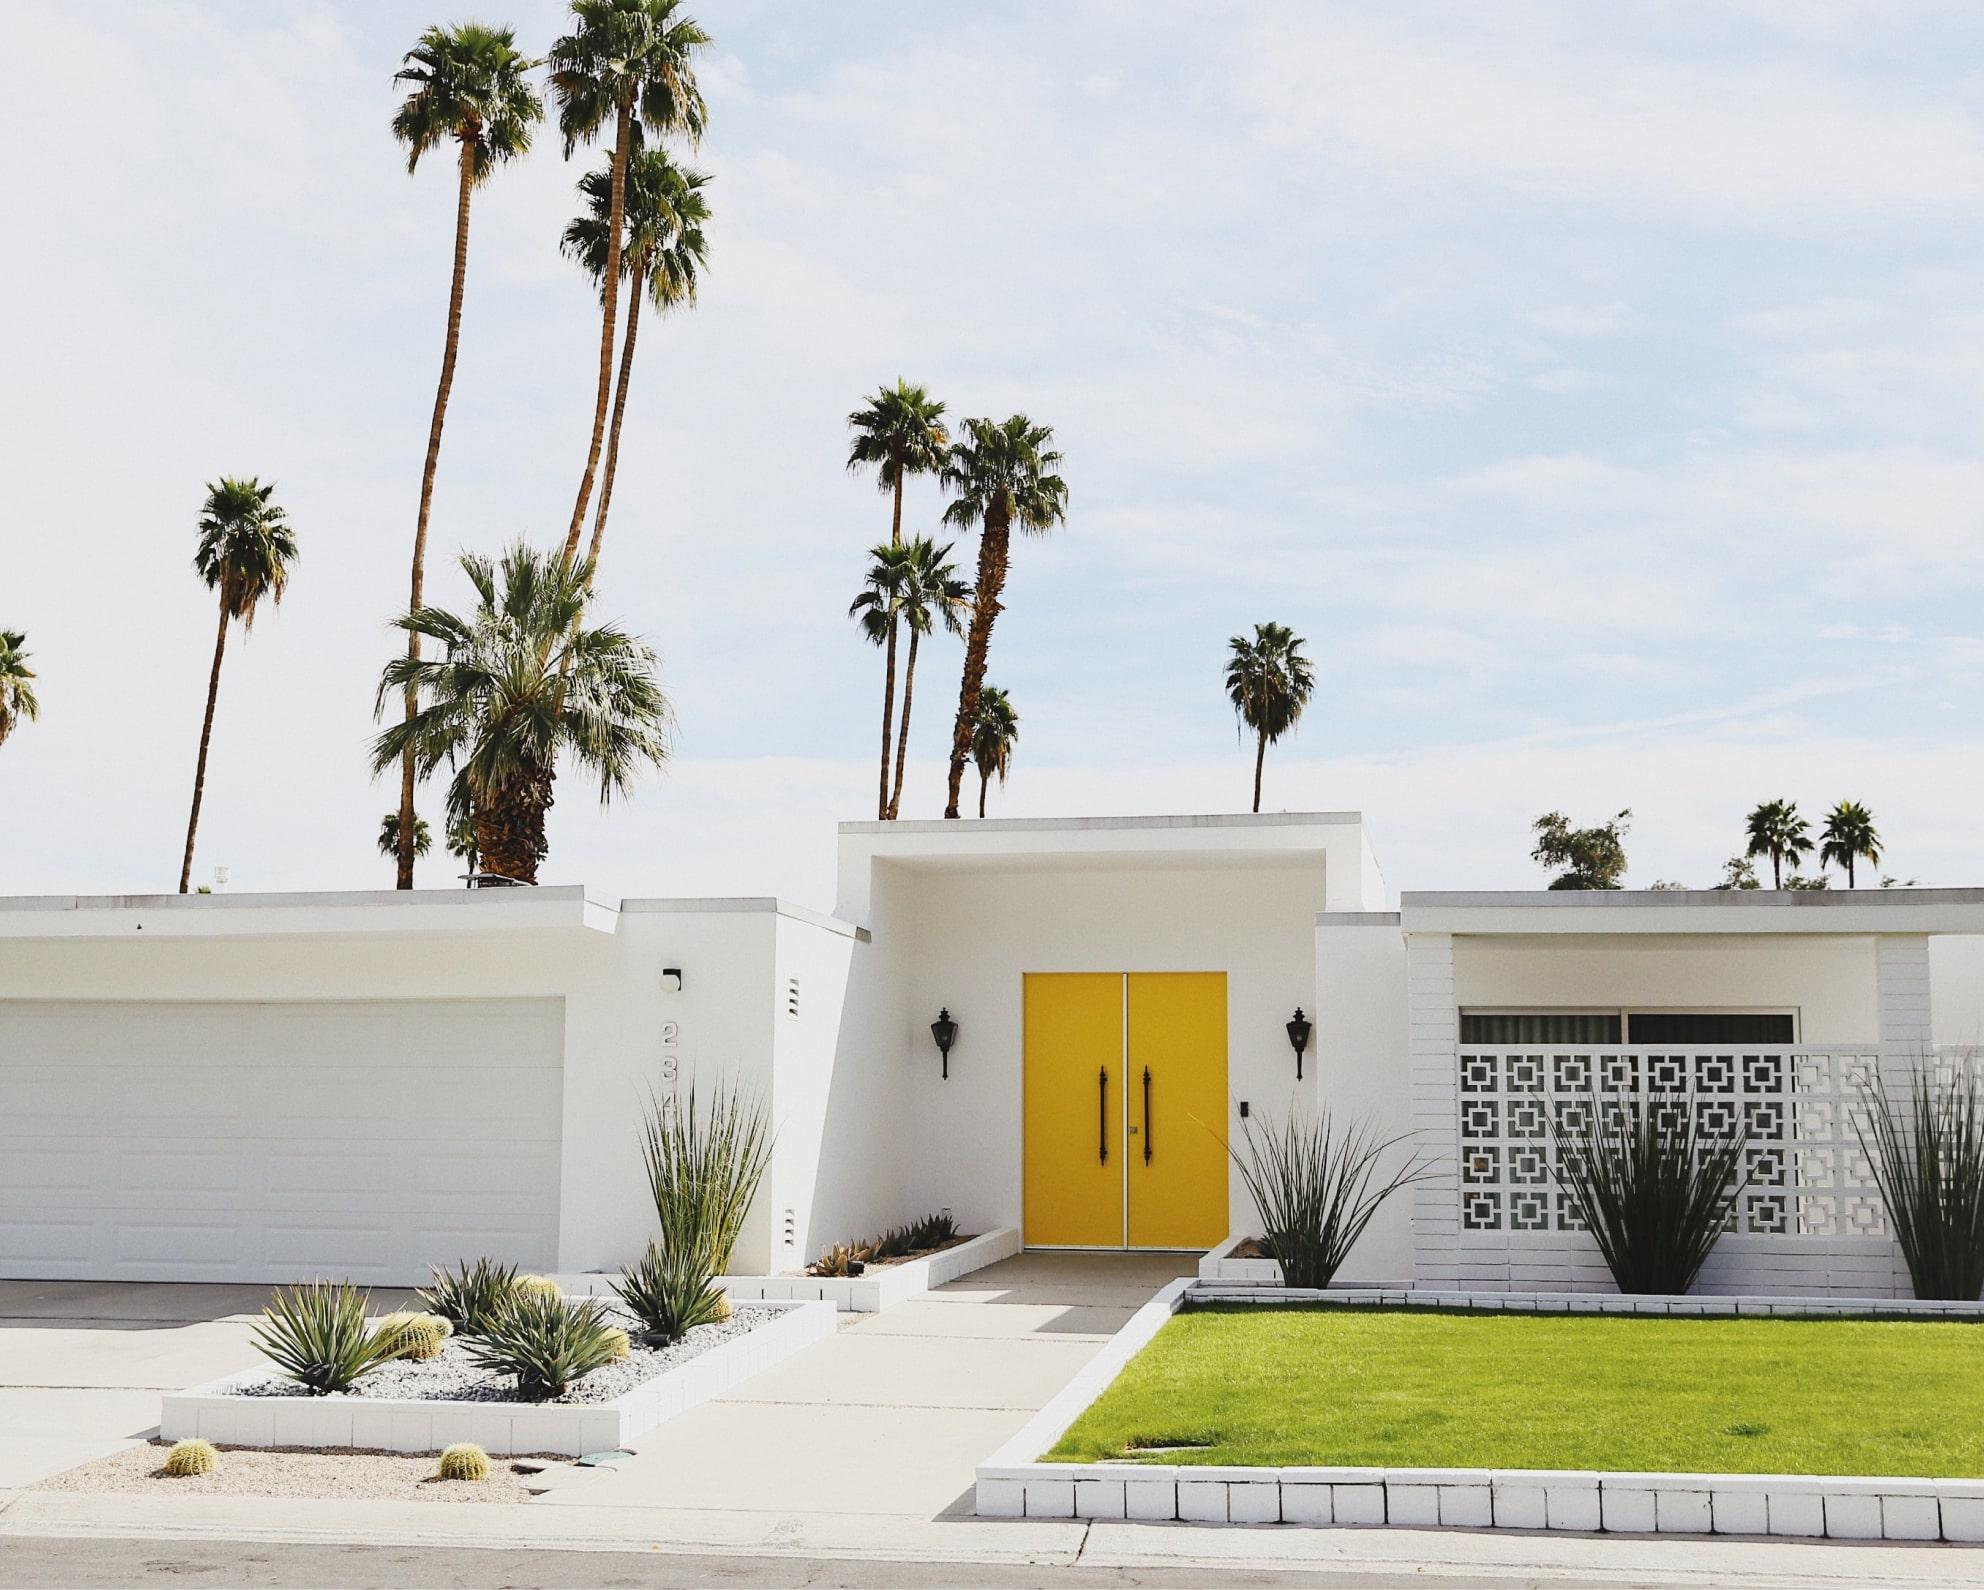 House with yellow door